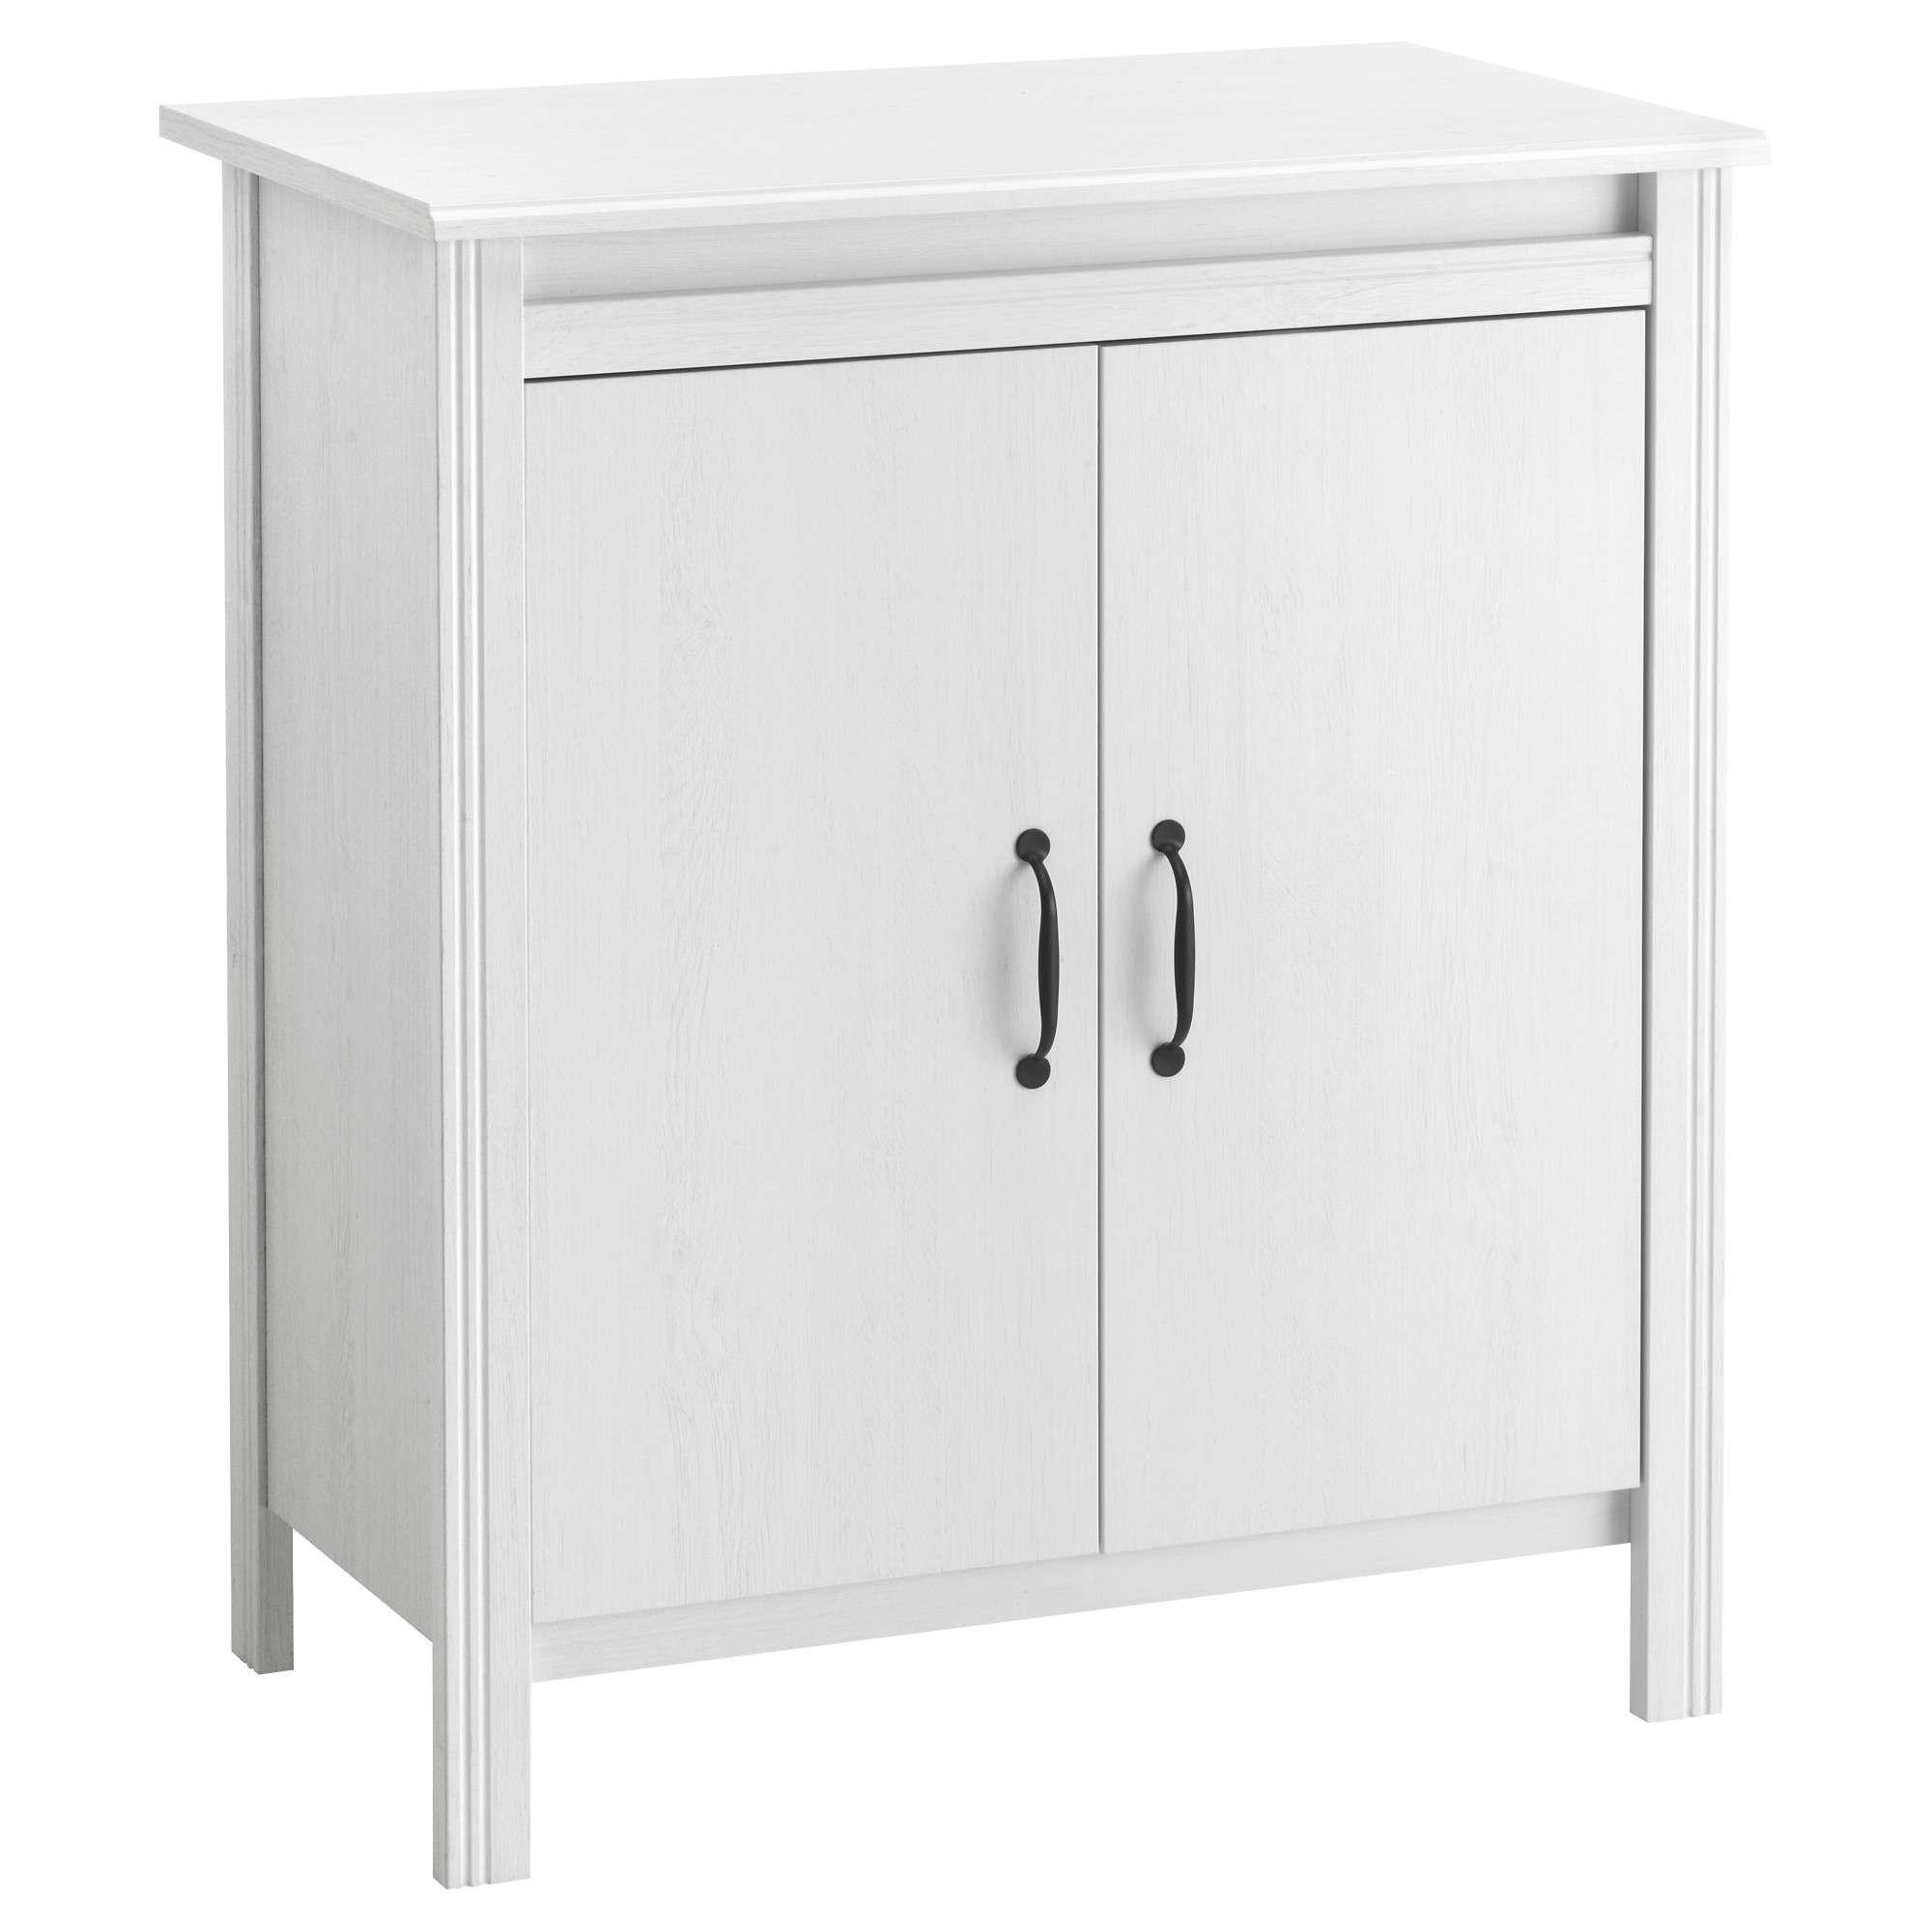 Cabinets & Sideboards – Ikea Regarding 12 Inch Deep Sideboards (View 12 of 20)